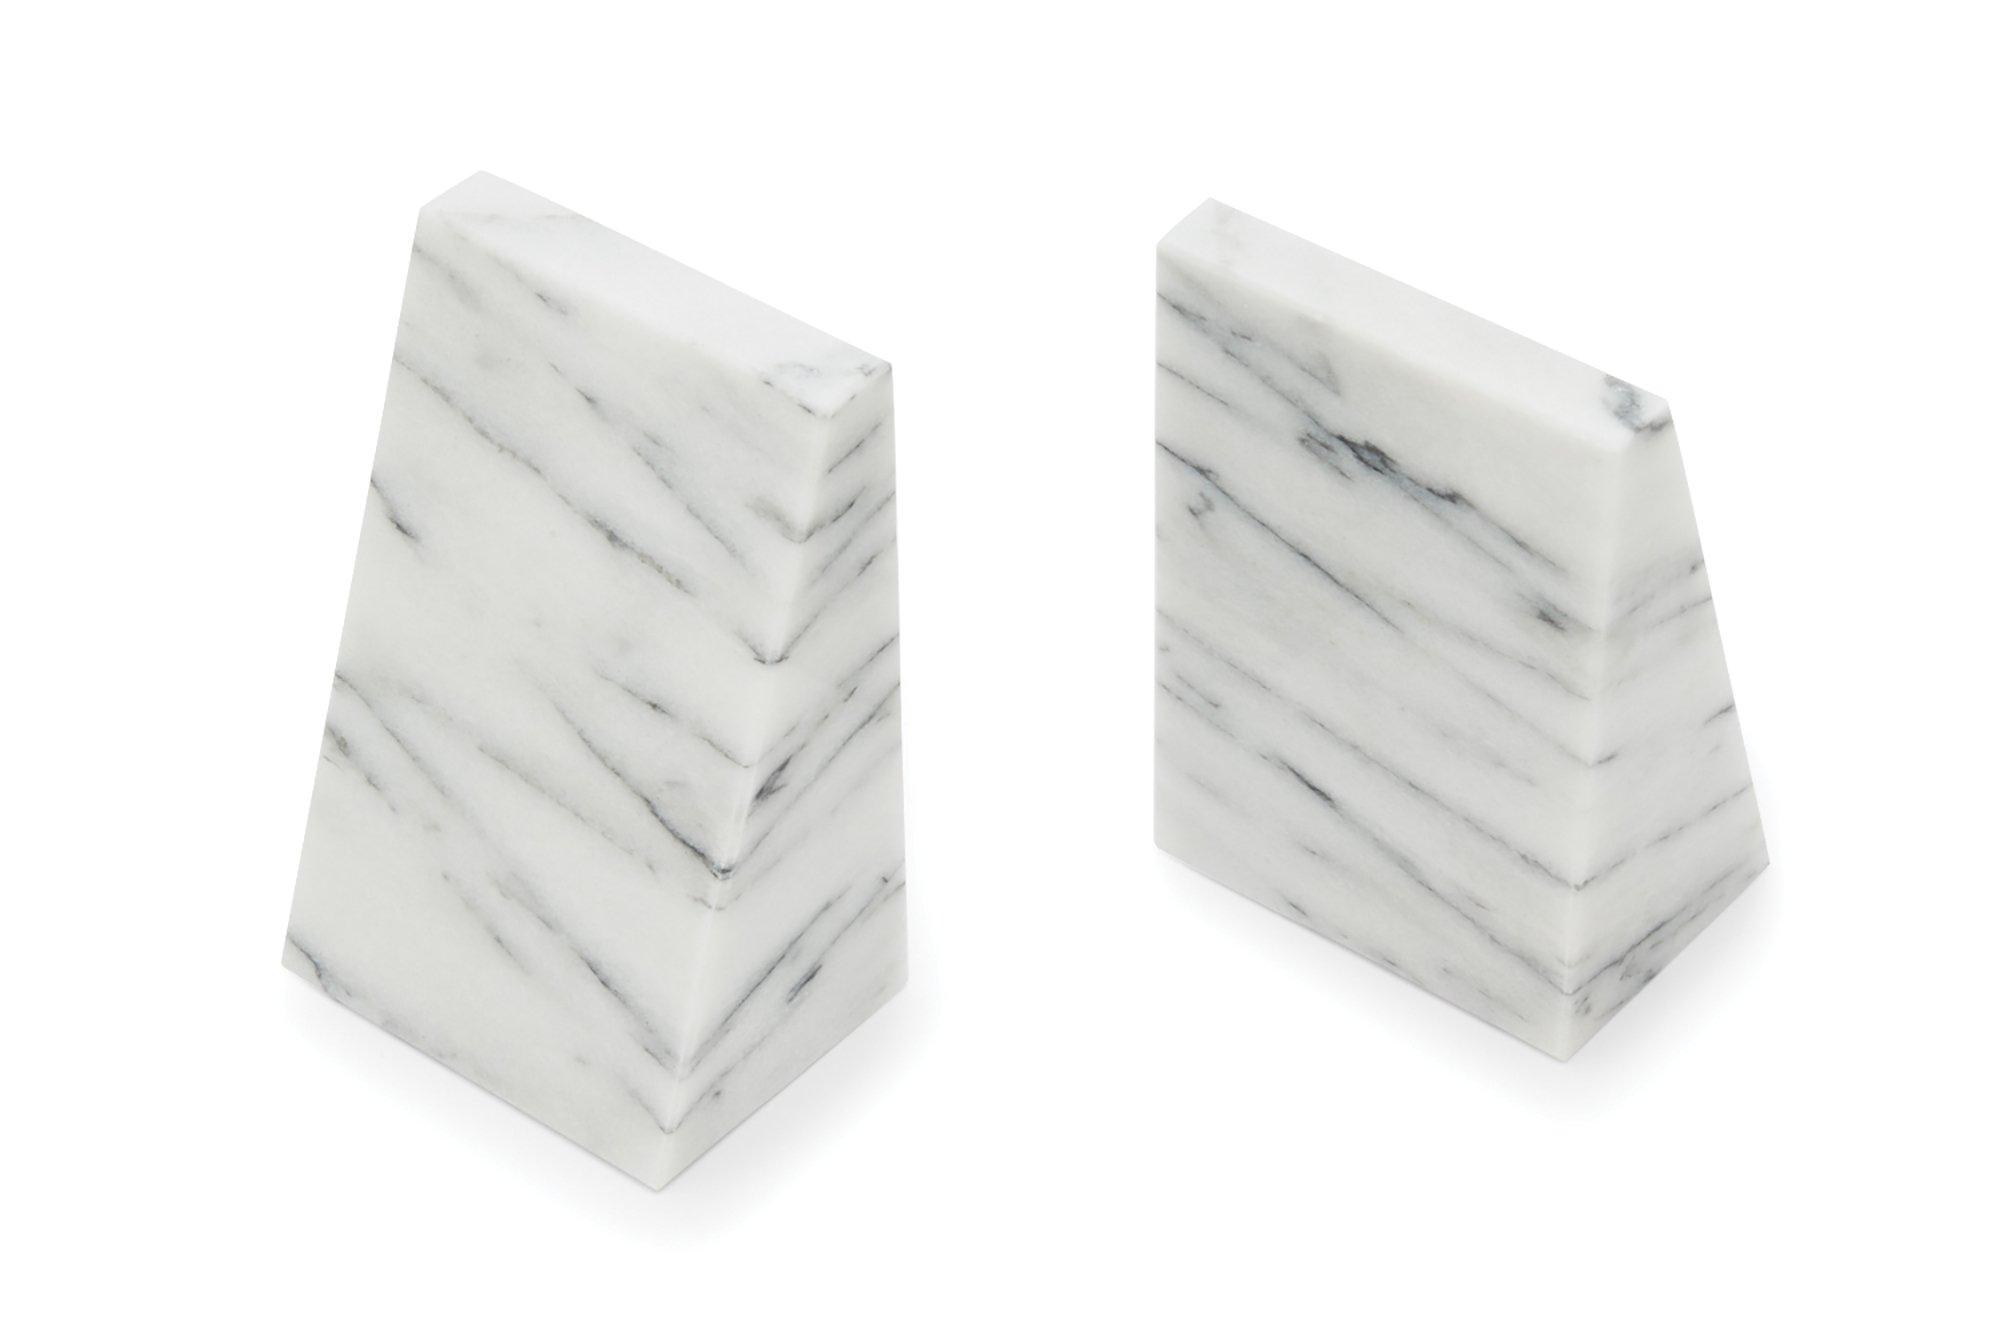 Fox Run Triangular 100% Natural Polished White Marble Bookends by Fox Run